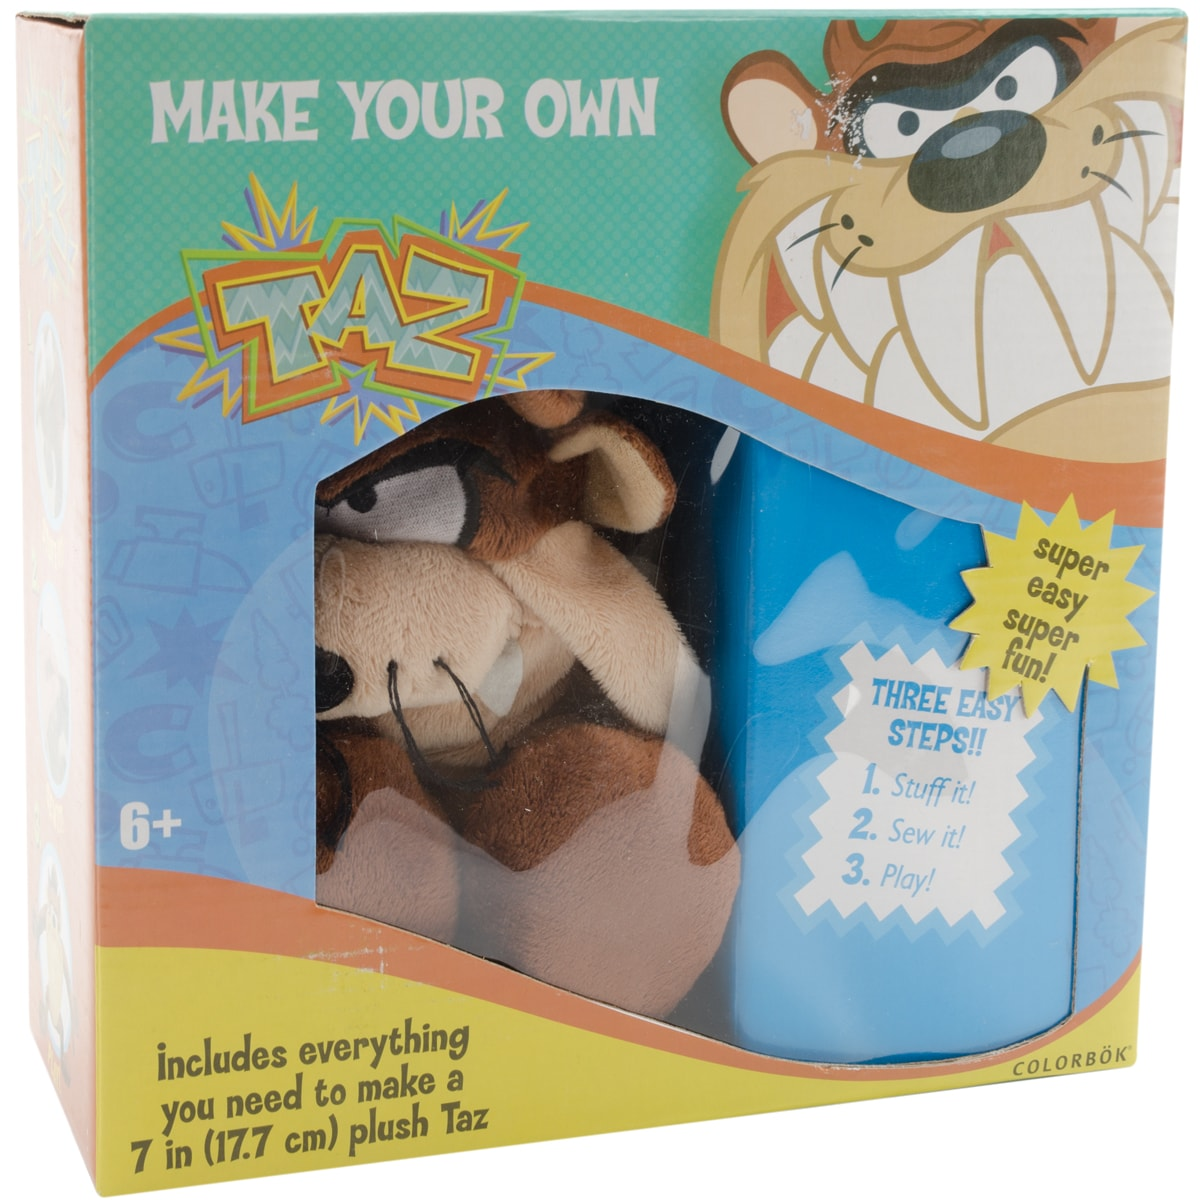 Make Your Own Taz Kit